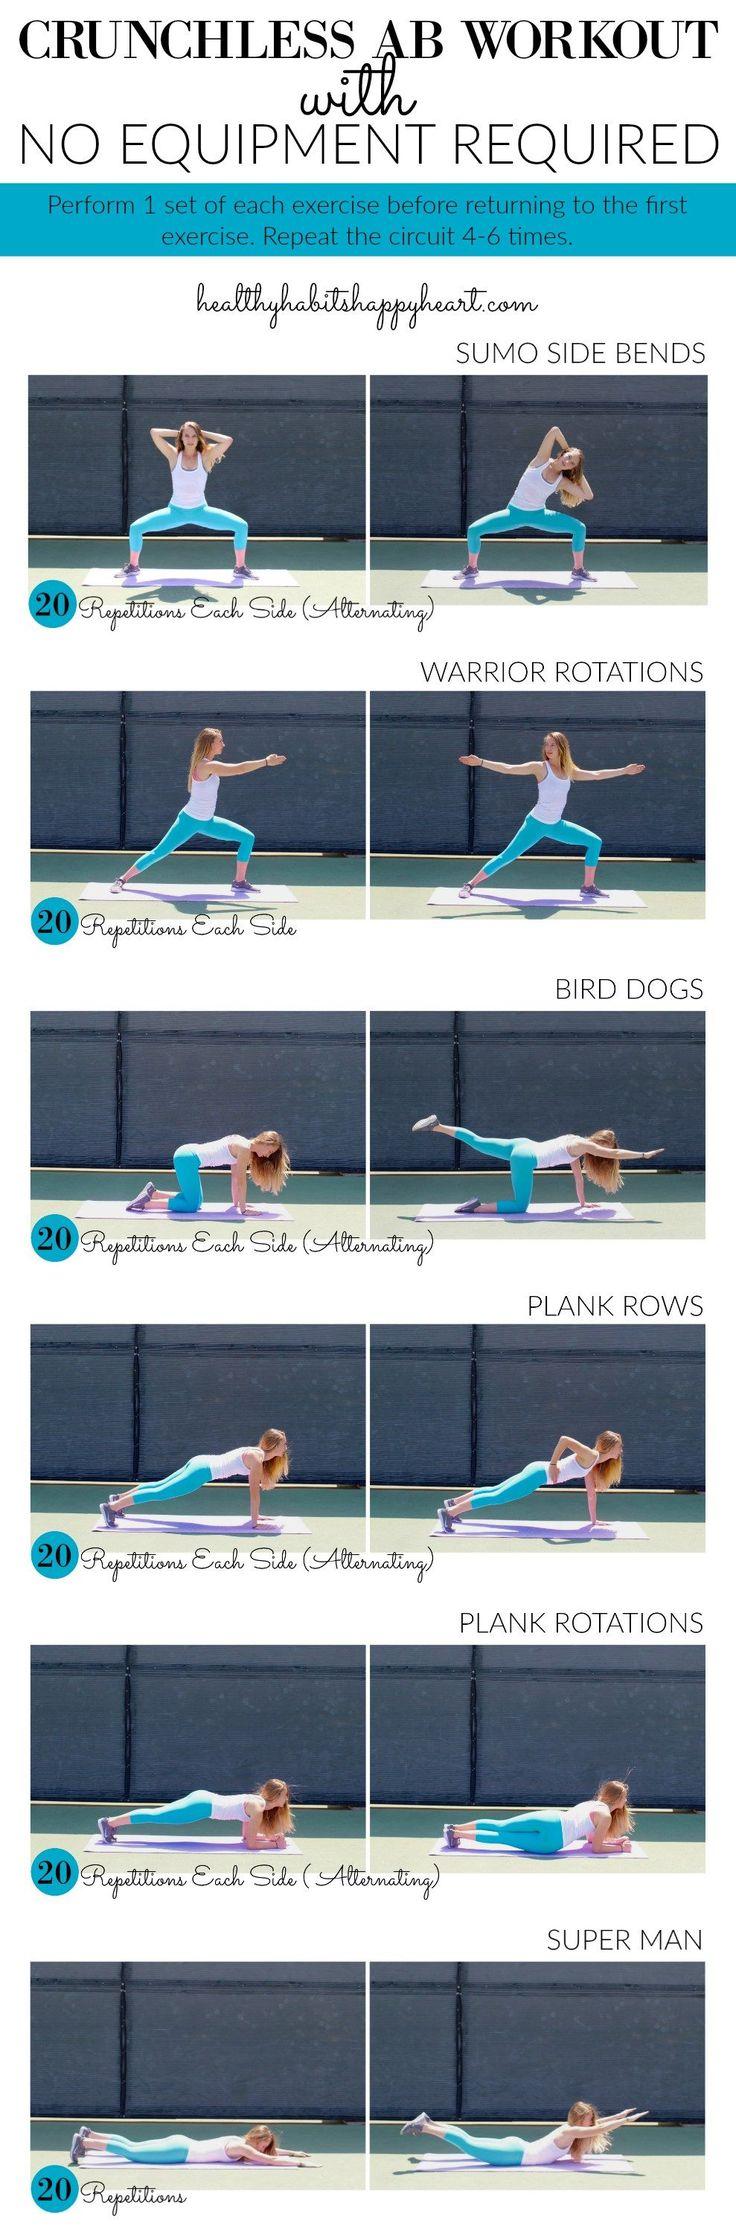 Crunchless Ab Workout | healthyhabitshappyheart.com